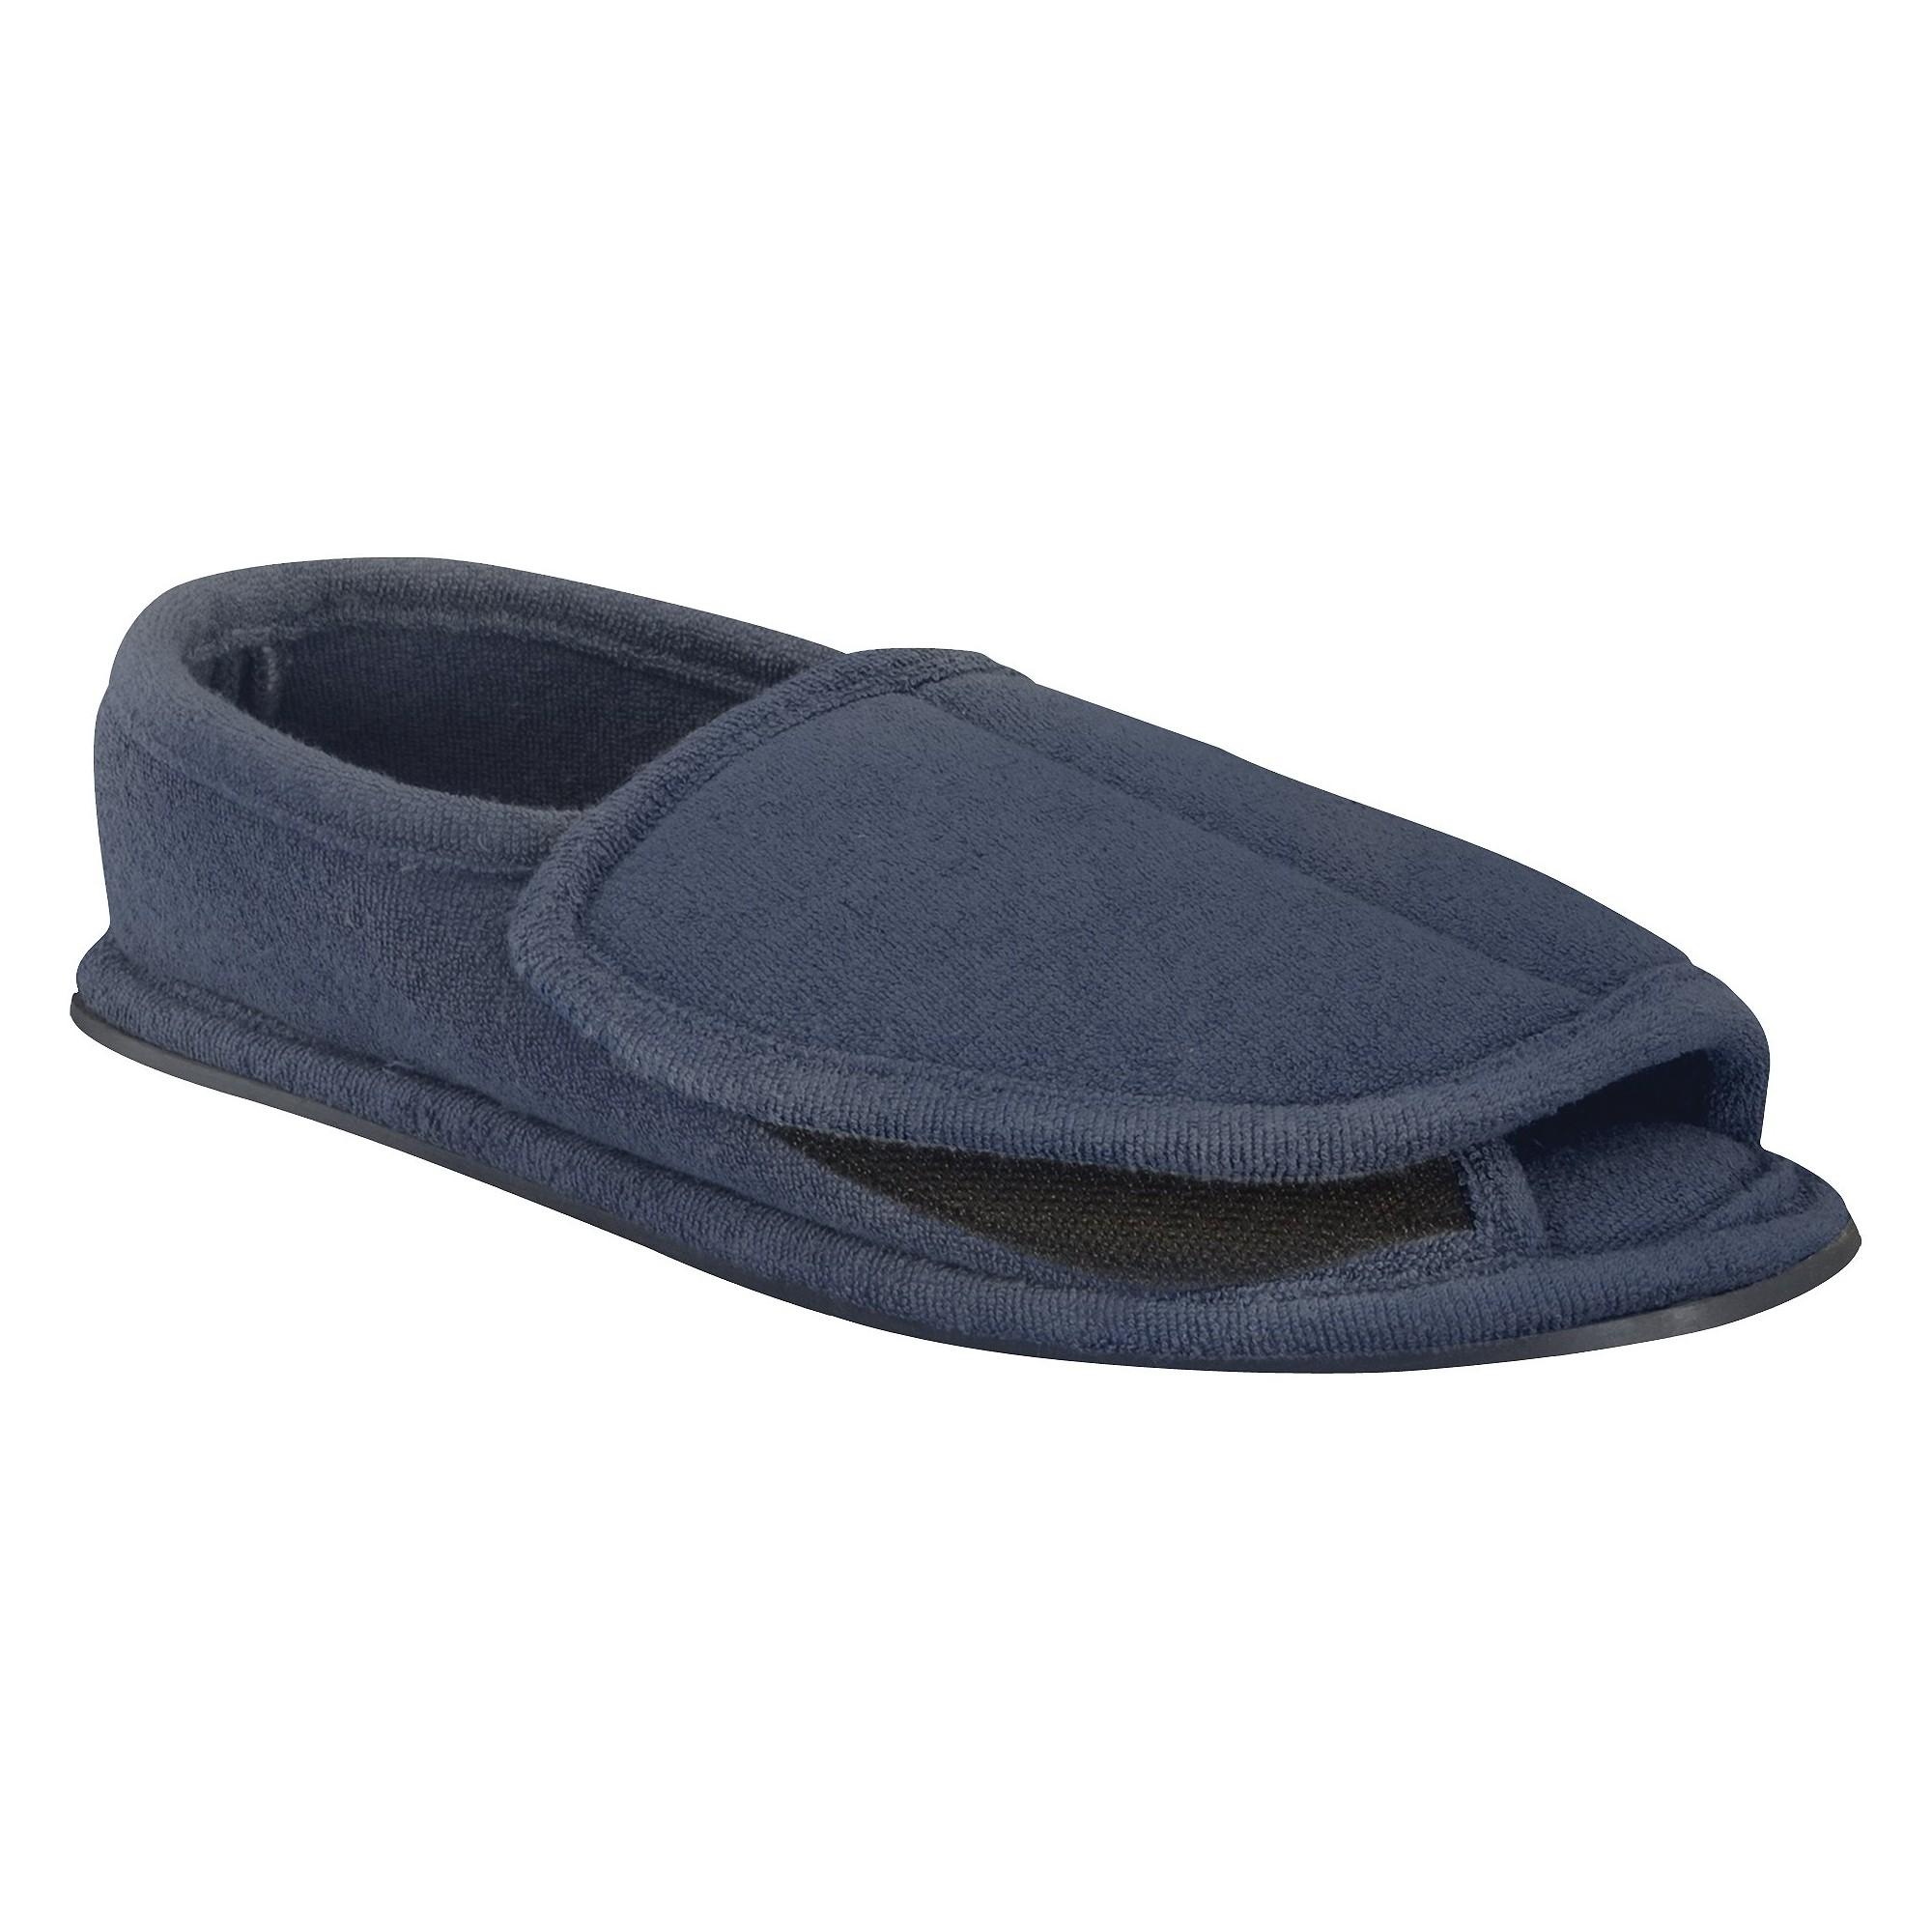 Men's MUK LUKS Adjustable Open Toe Slipper - Navy L(11.5-13), Size: Large (11.5-13), Blue